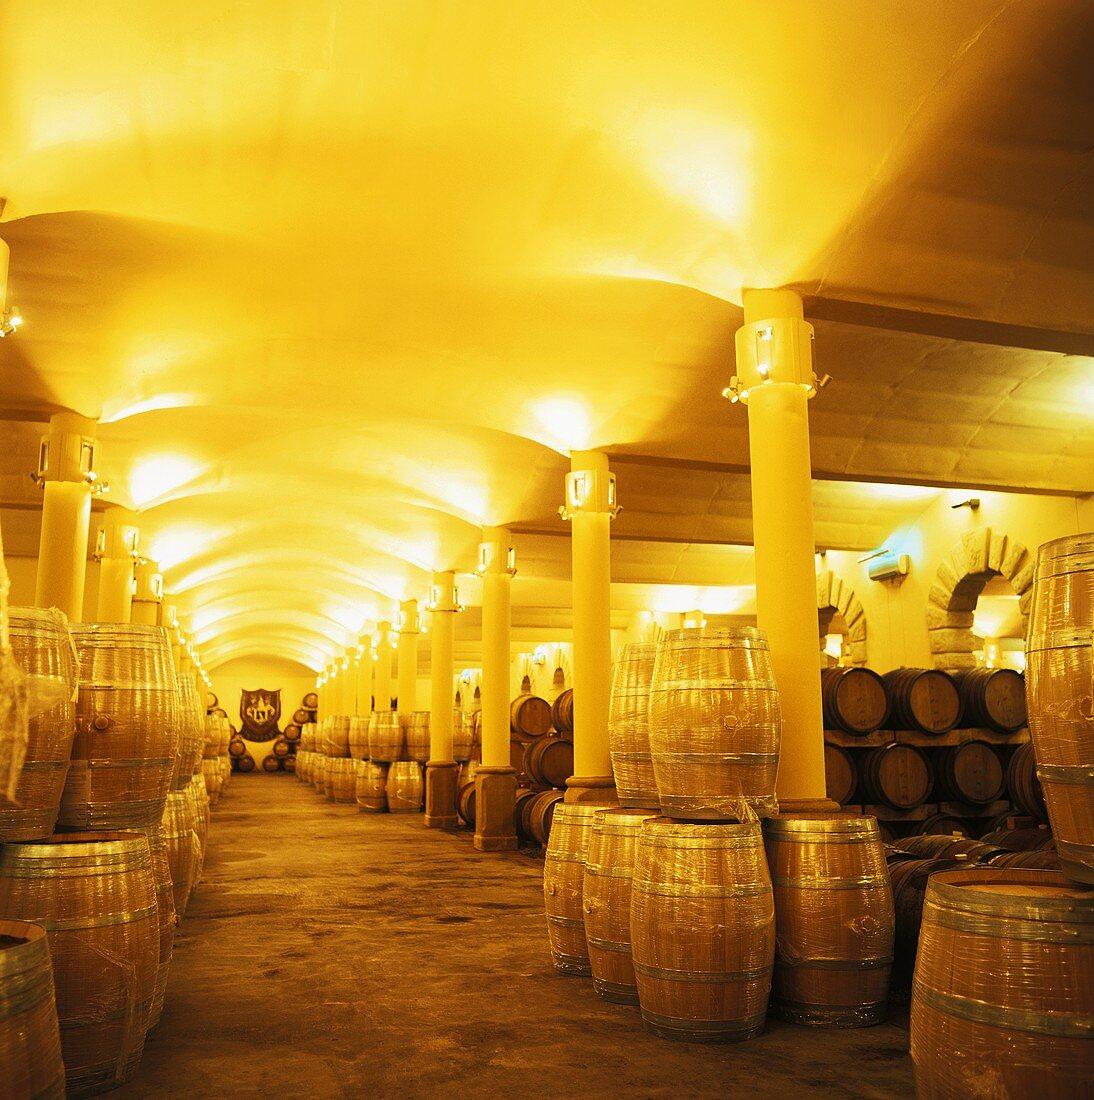 Wine cellar, Fredericksburg Estate, Simondium, Paarl, S. Africa